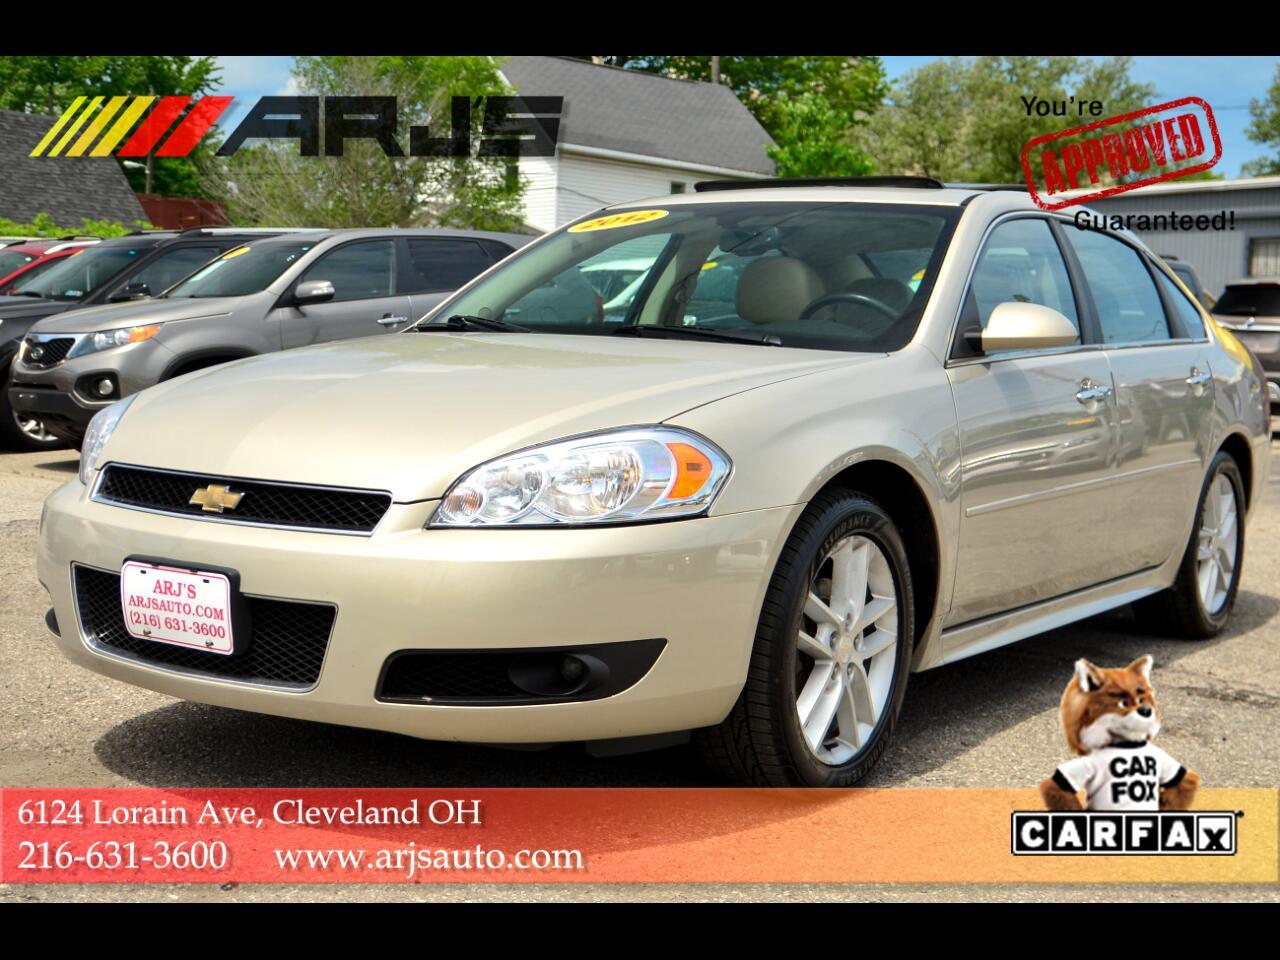 Chevrolet Impala 4dr Sdn LTZ 2012